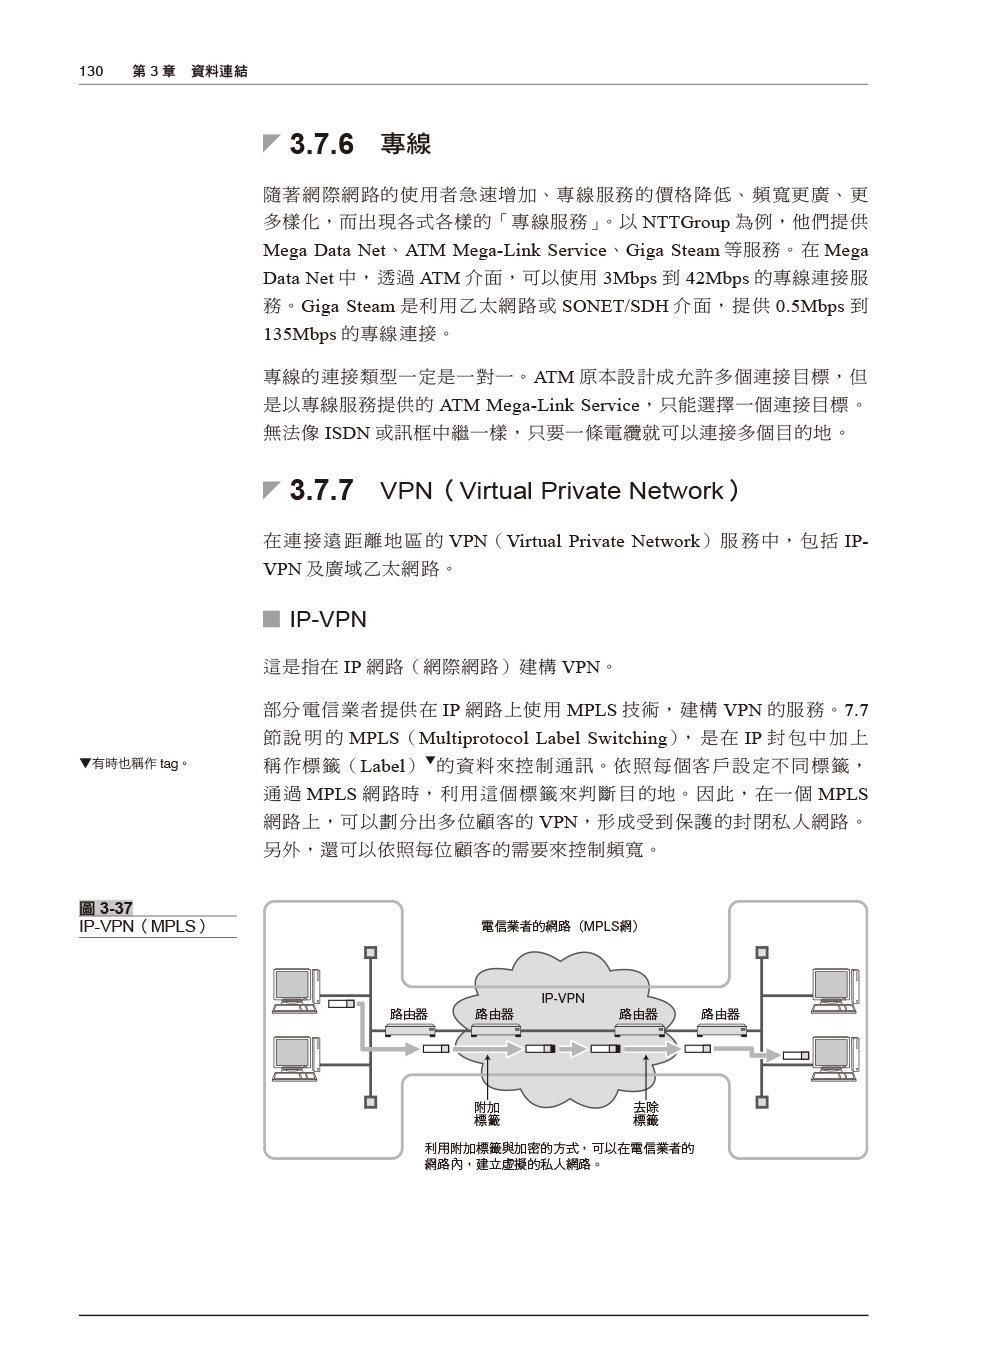 圖解 TCP/IP 網路通訊協定 (涵蓋IPv6)-preview-8